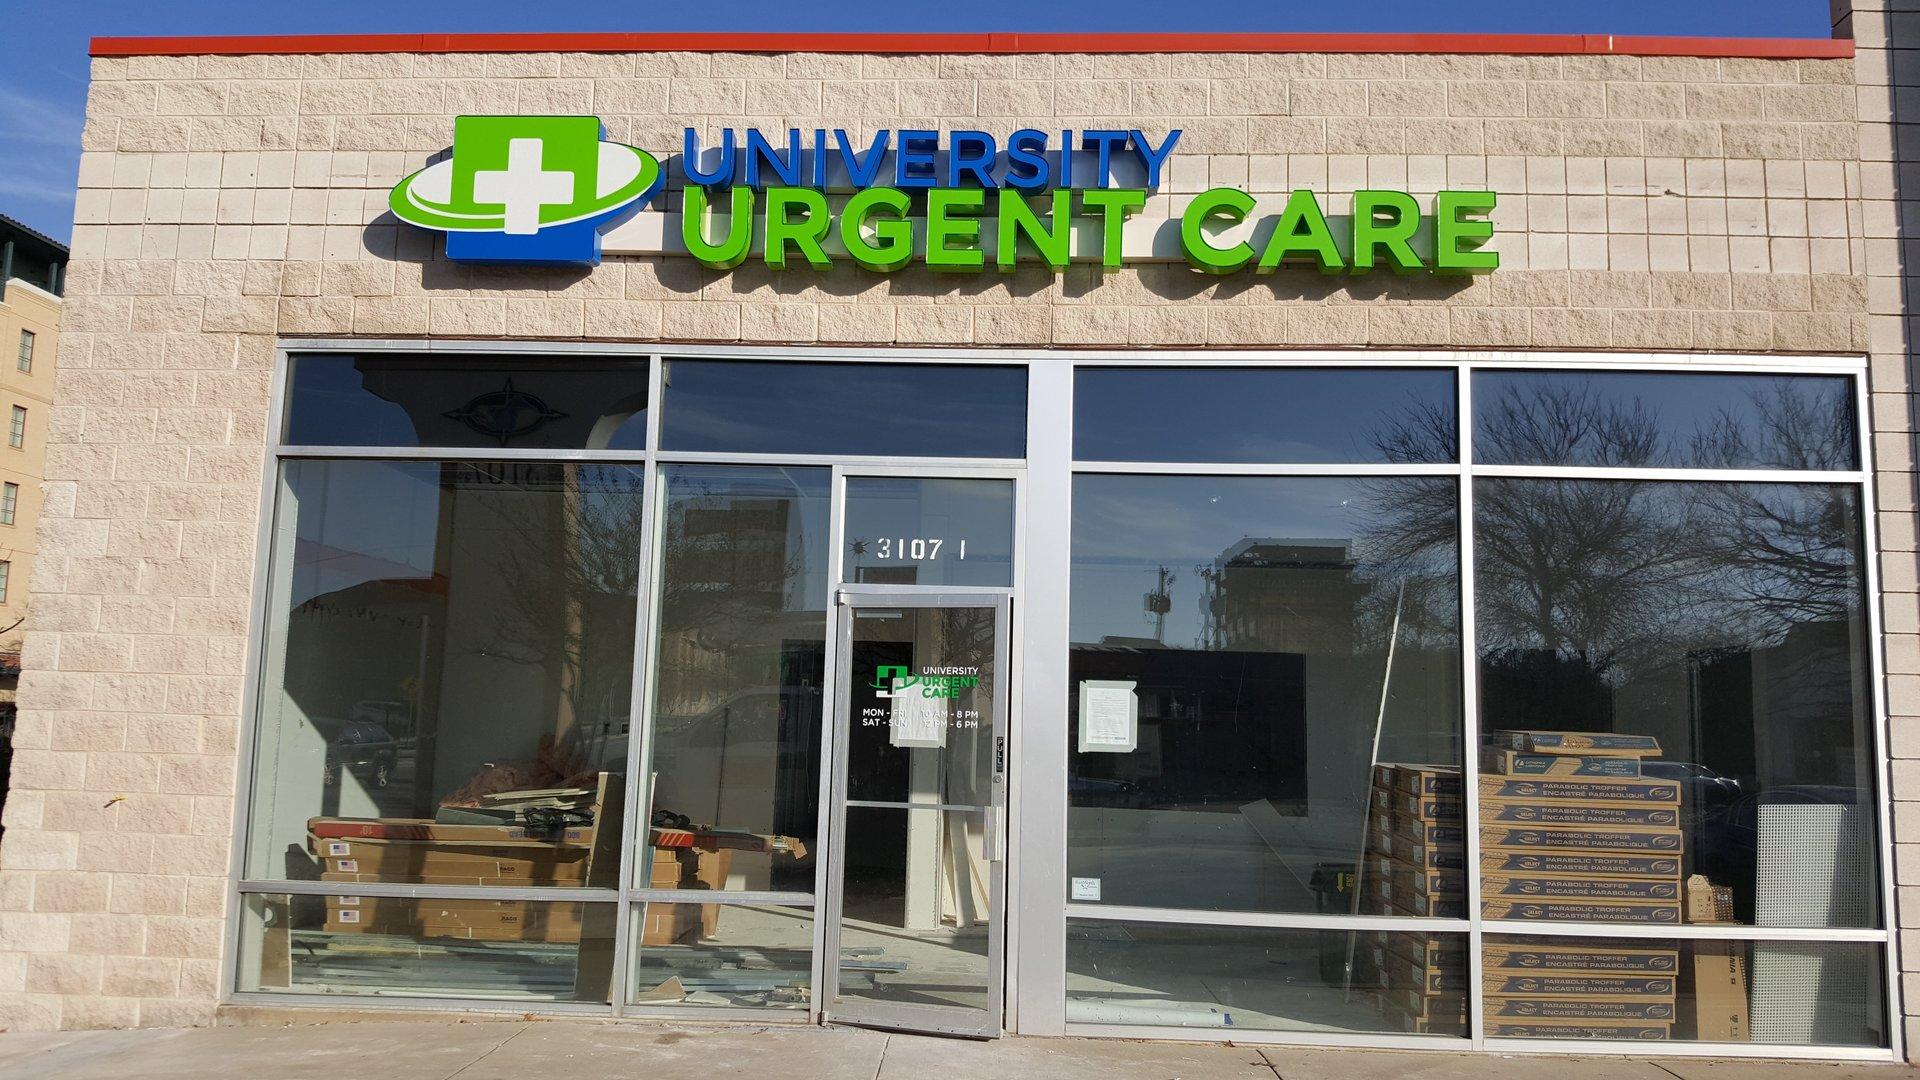 University urgent care sign